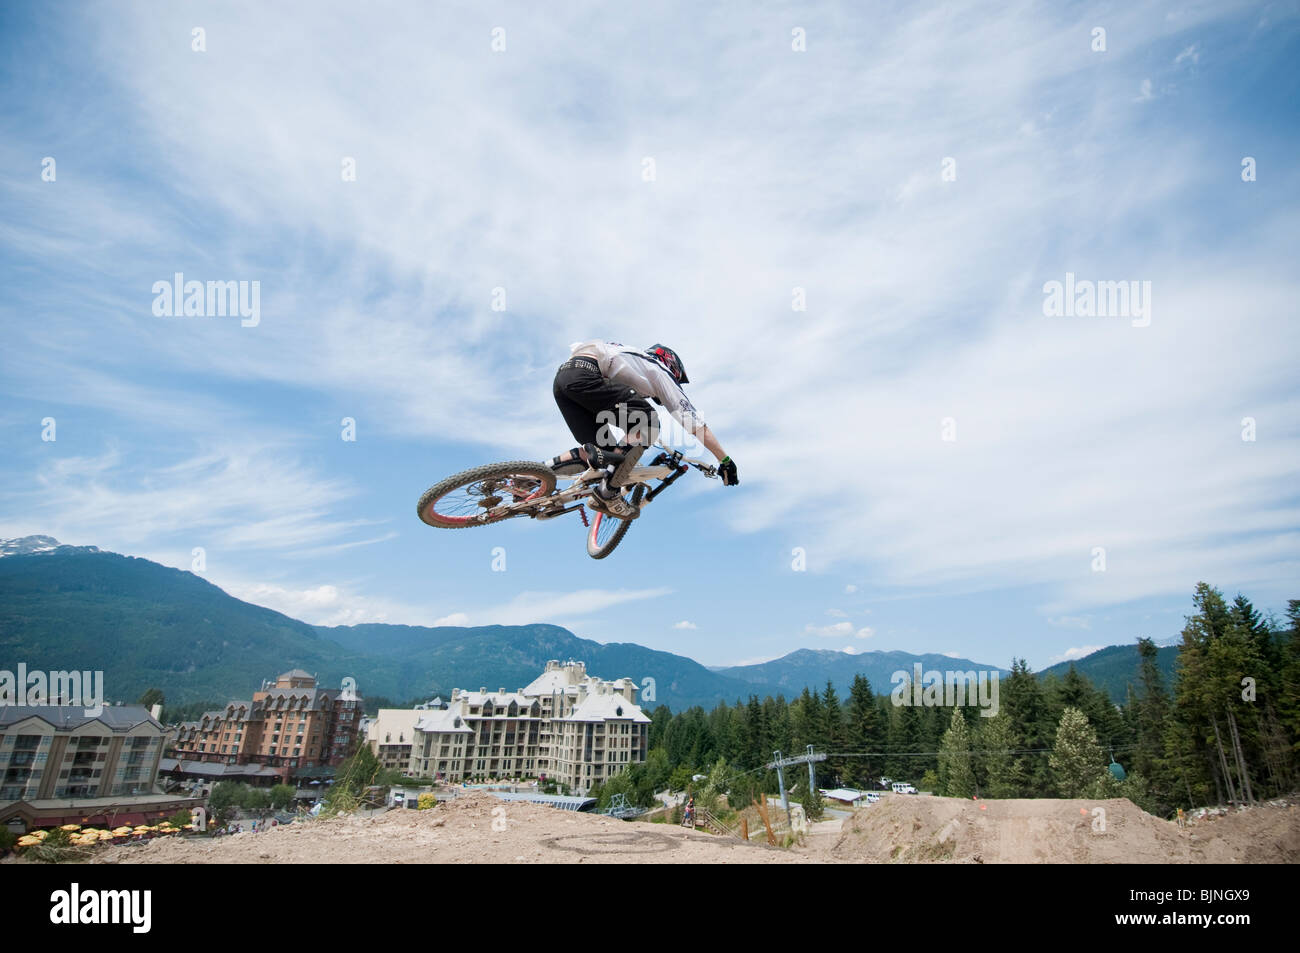 Downhill Mountainbiken im berühmten Whistler Bikepark Stockfoto